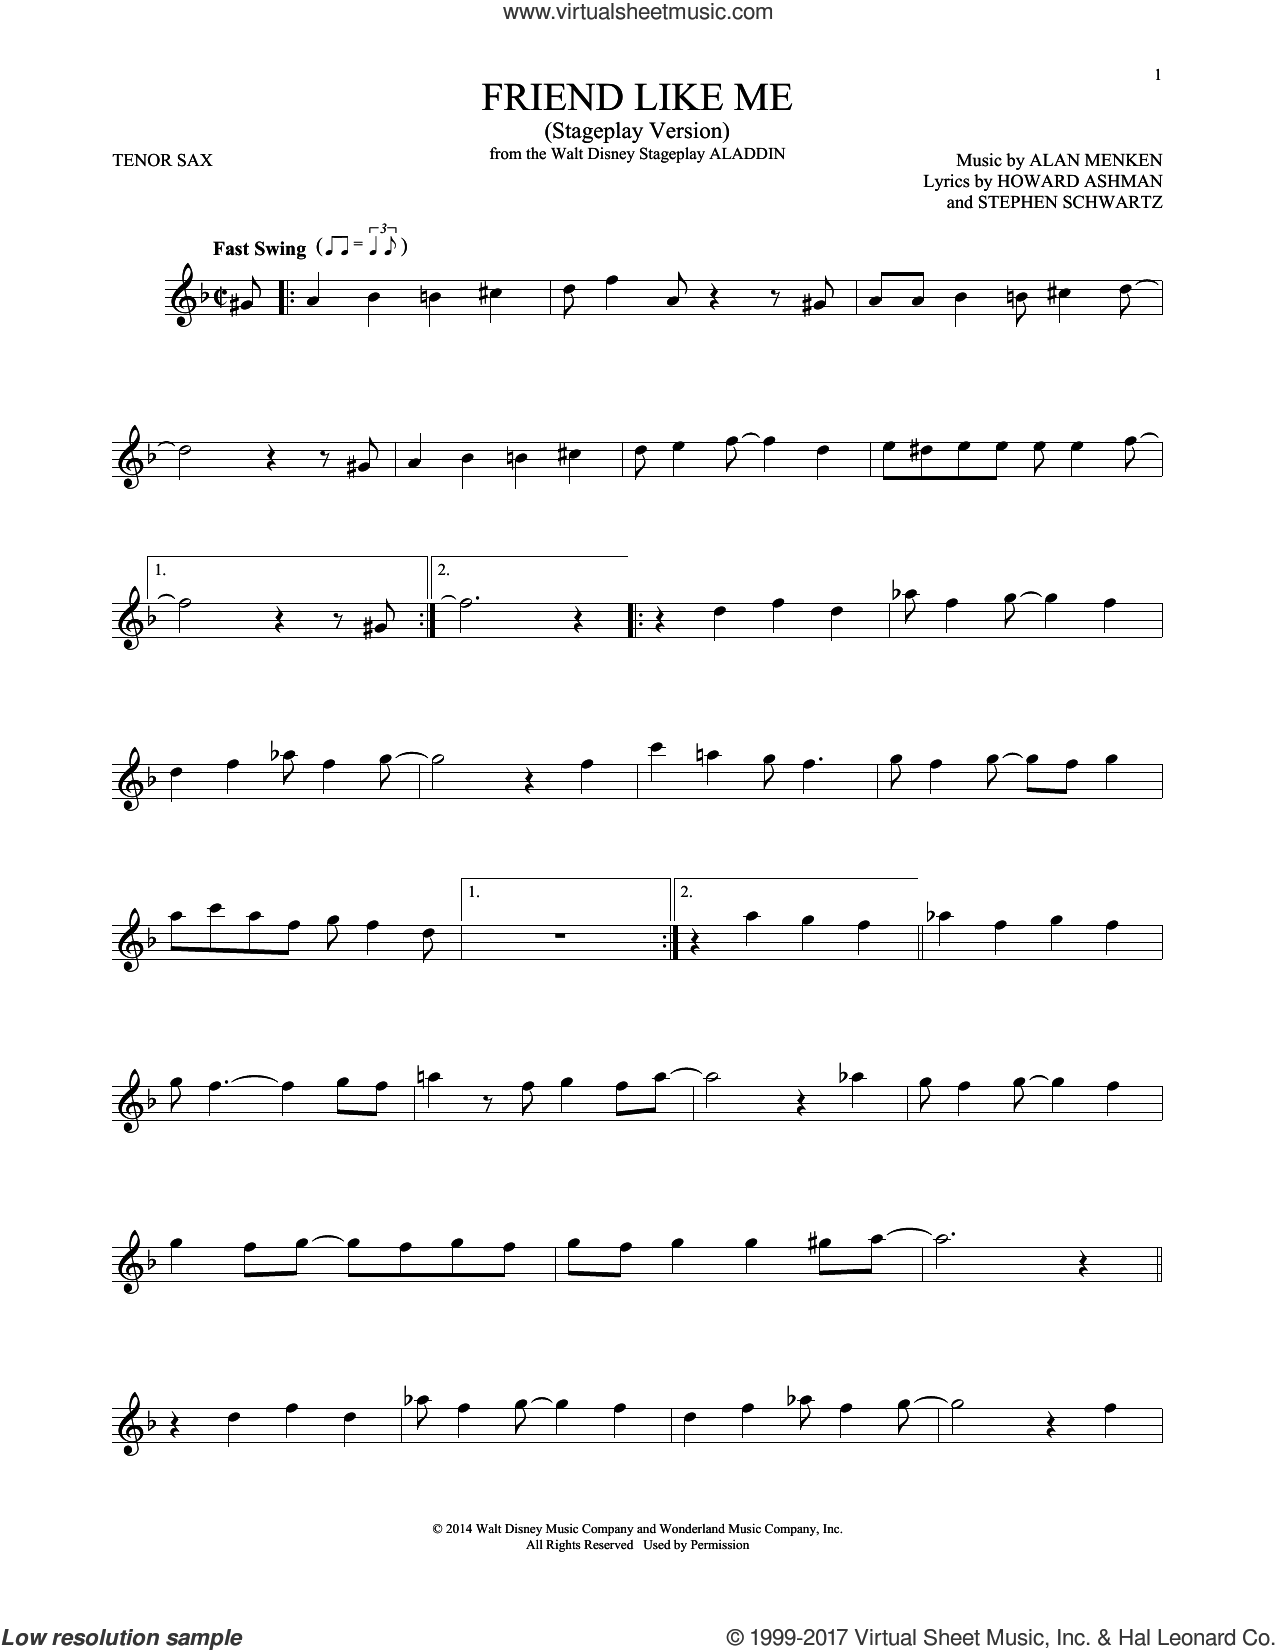 Friend Like Me (from Aladdin) (Stageplay Version) sheet music for tenor saxophone solo by Alan Menken, Howard Ashman and Stephen Schwartz, intermediate skill level